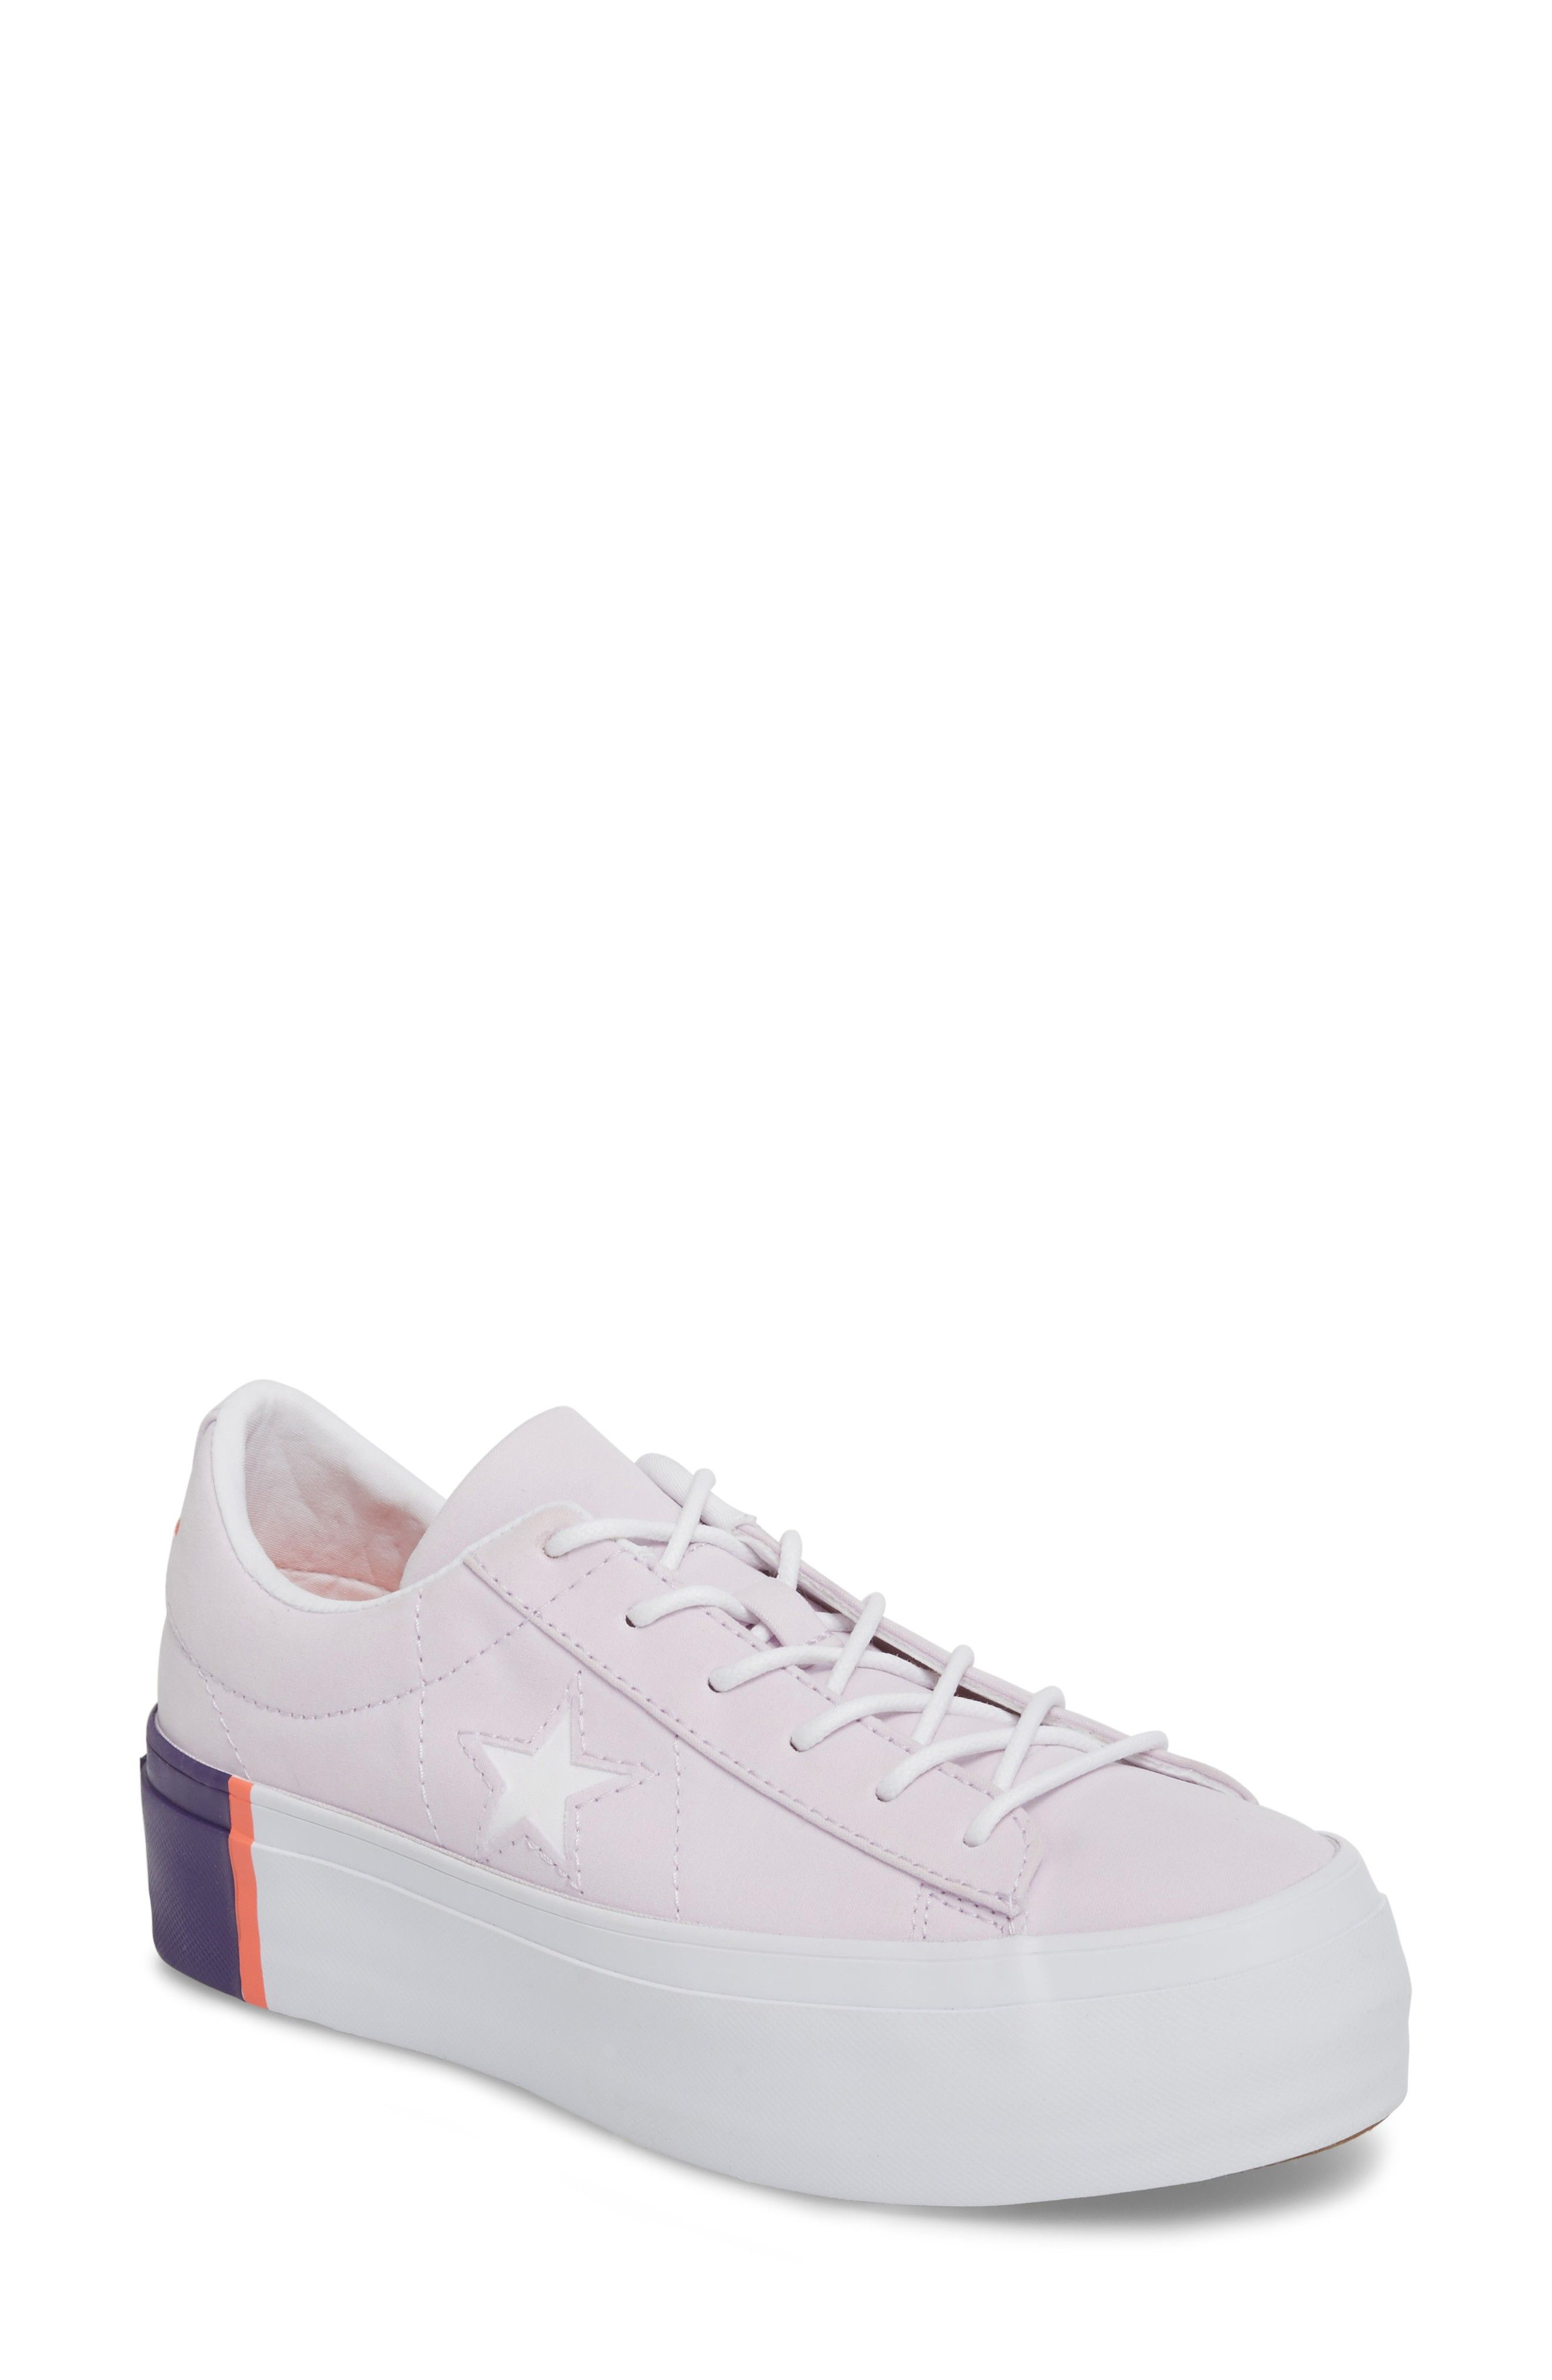 fda65cdc1731b6 Buy CONVERSE Chuck Taylor  All Star  One Star Platform Sneaker online. New CONVERSE  Shoes.   90  SKU VNER15991EZKO72486